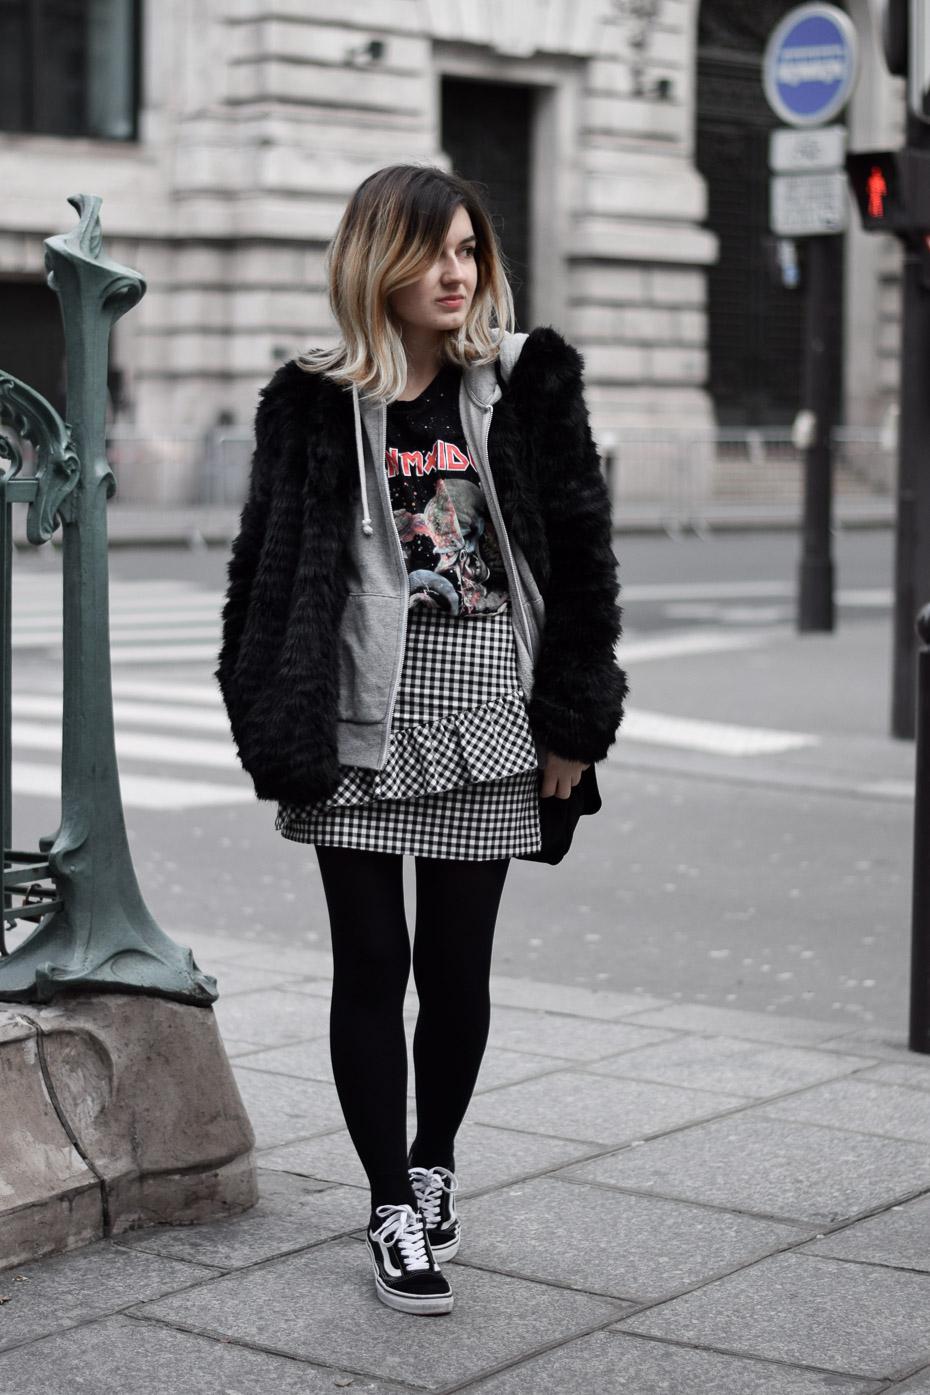 blogueuse lyonnaise outfit winter look vans old skool